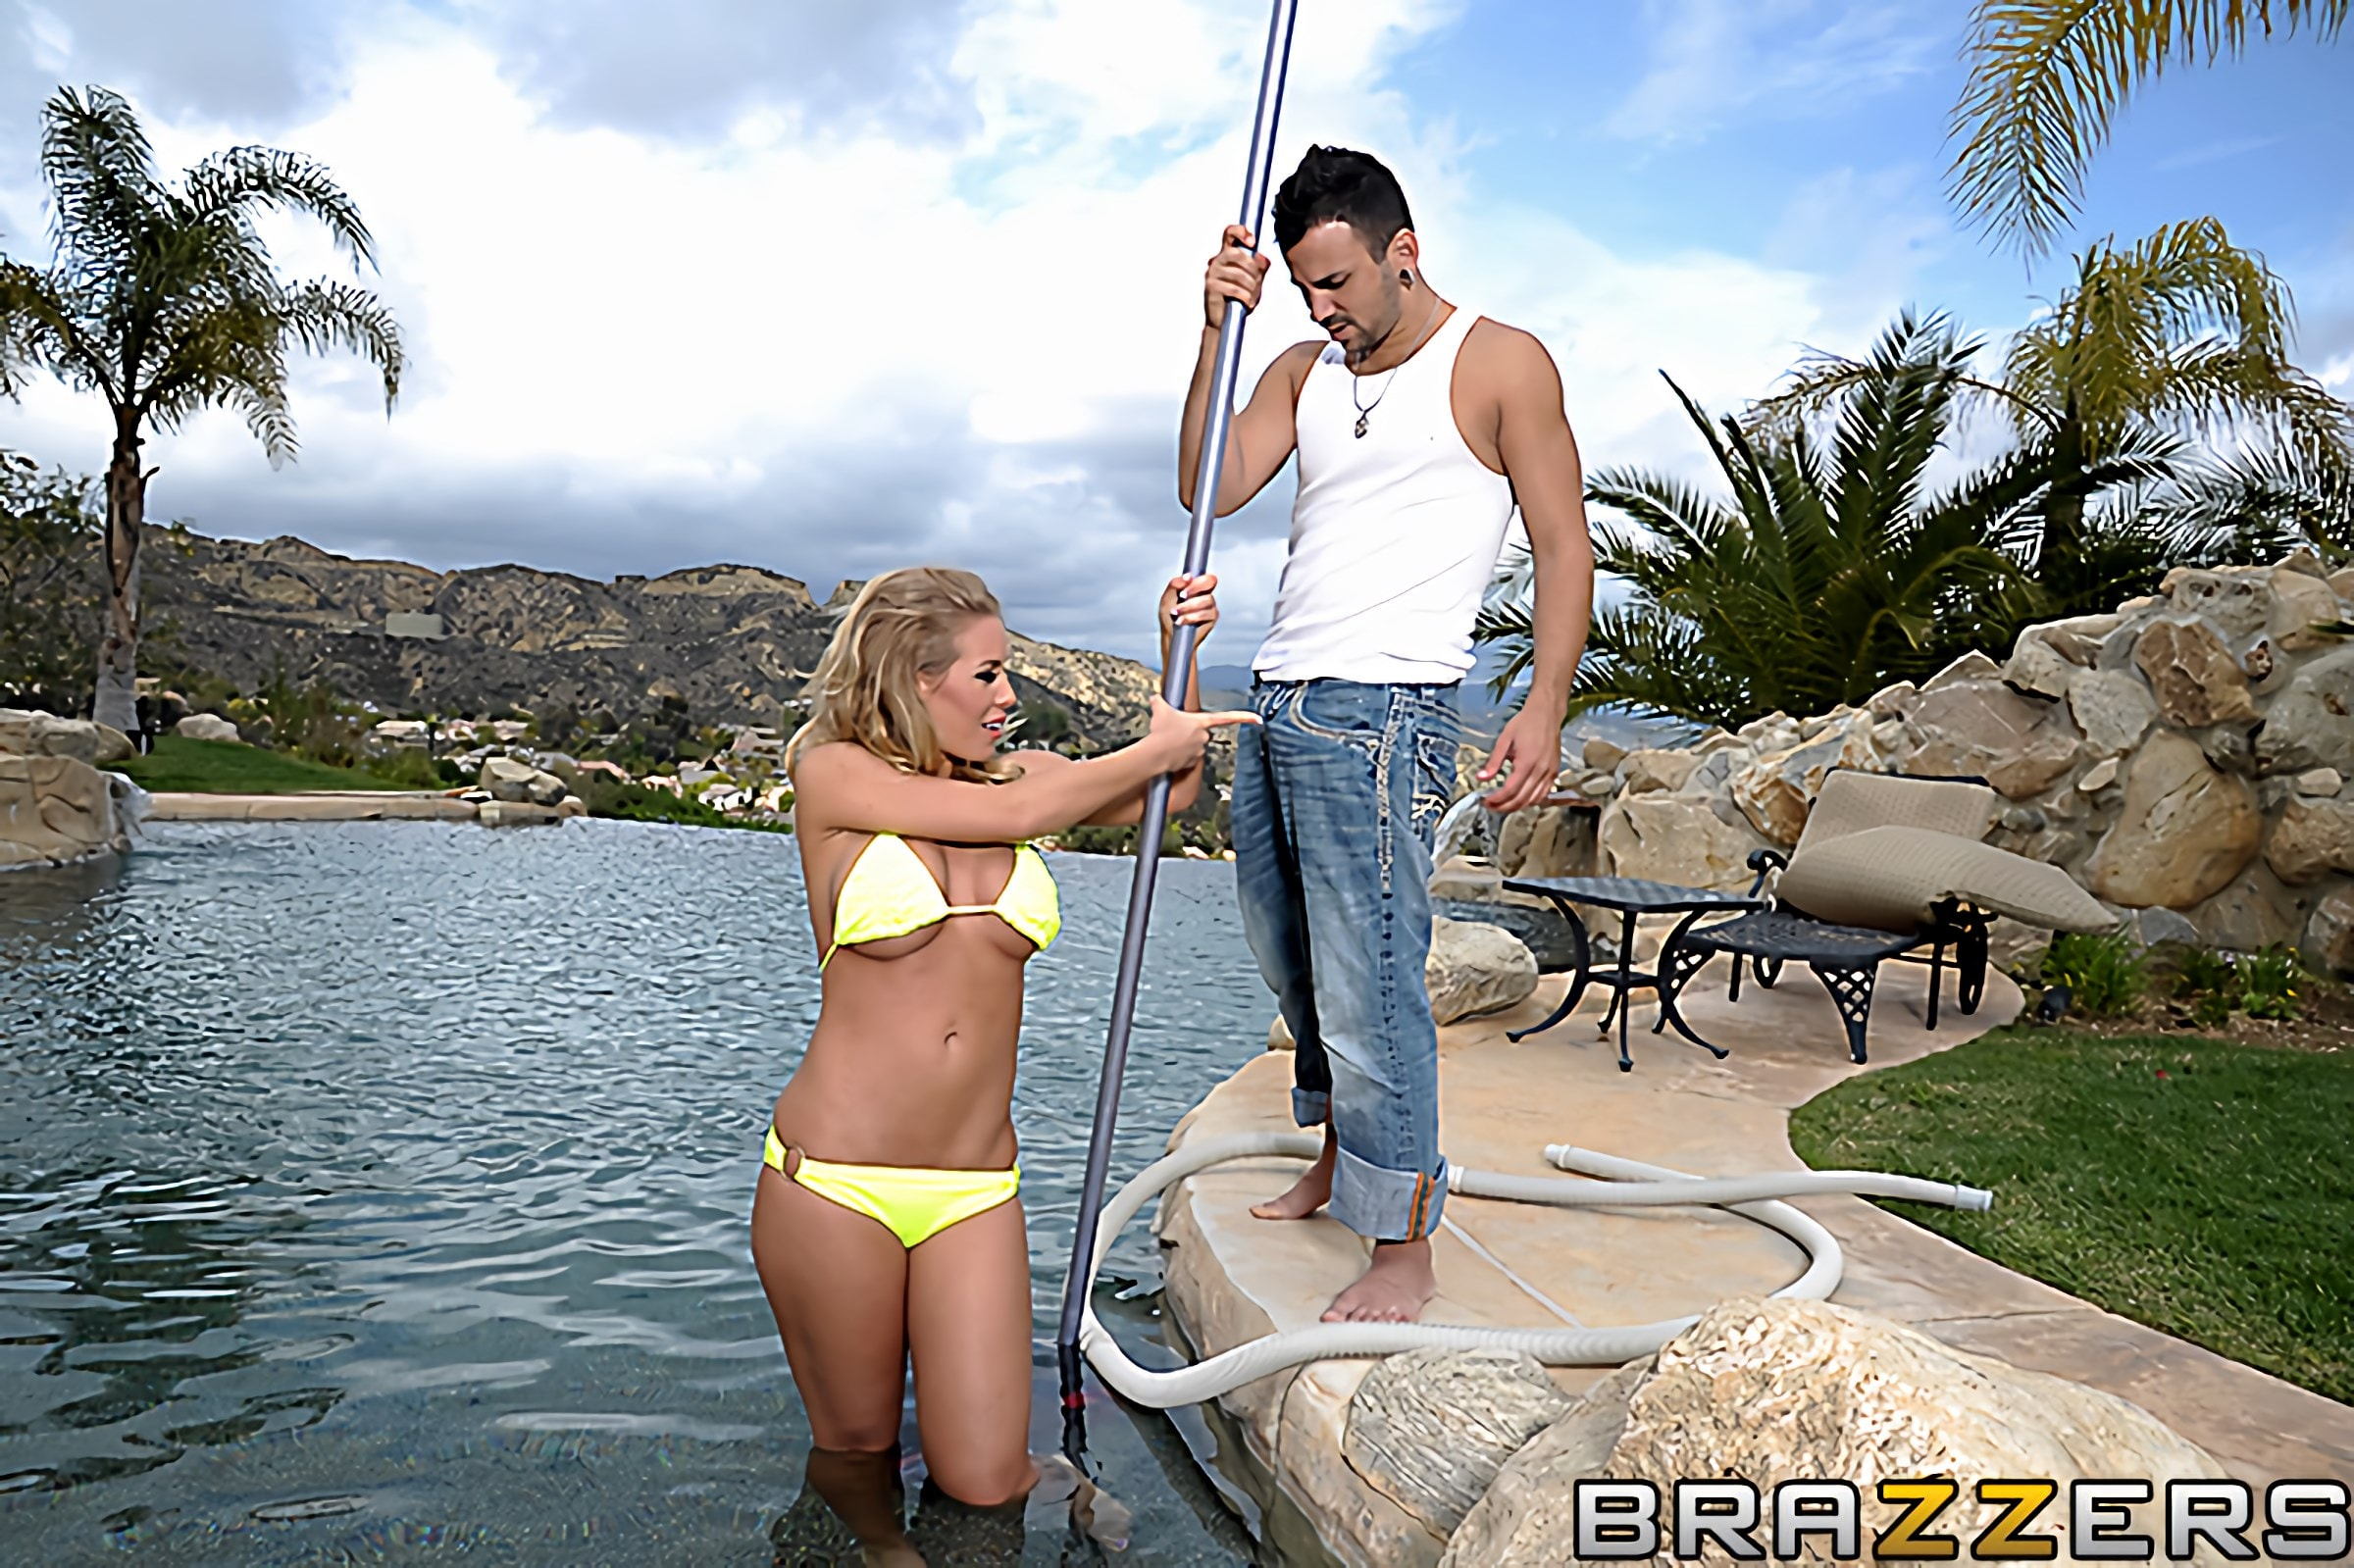 Brazzers 'Greasy Grip Training' starring Nicole Aniston (Photo 10)